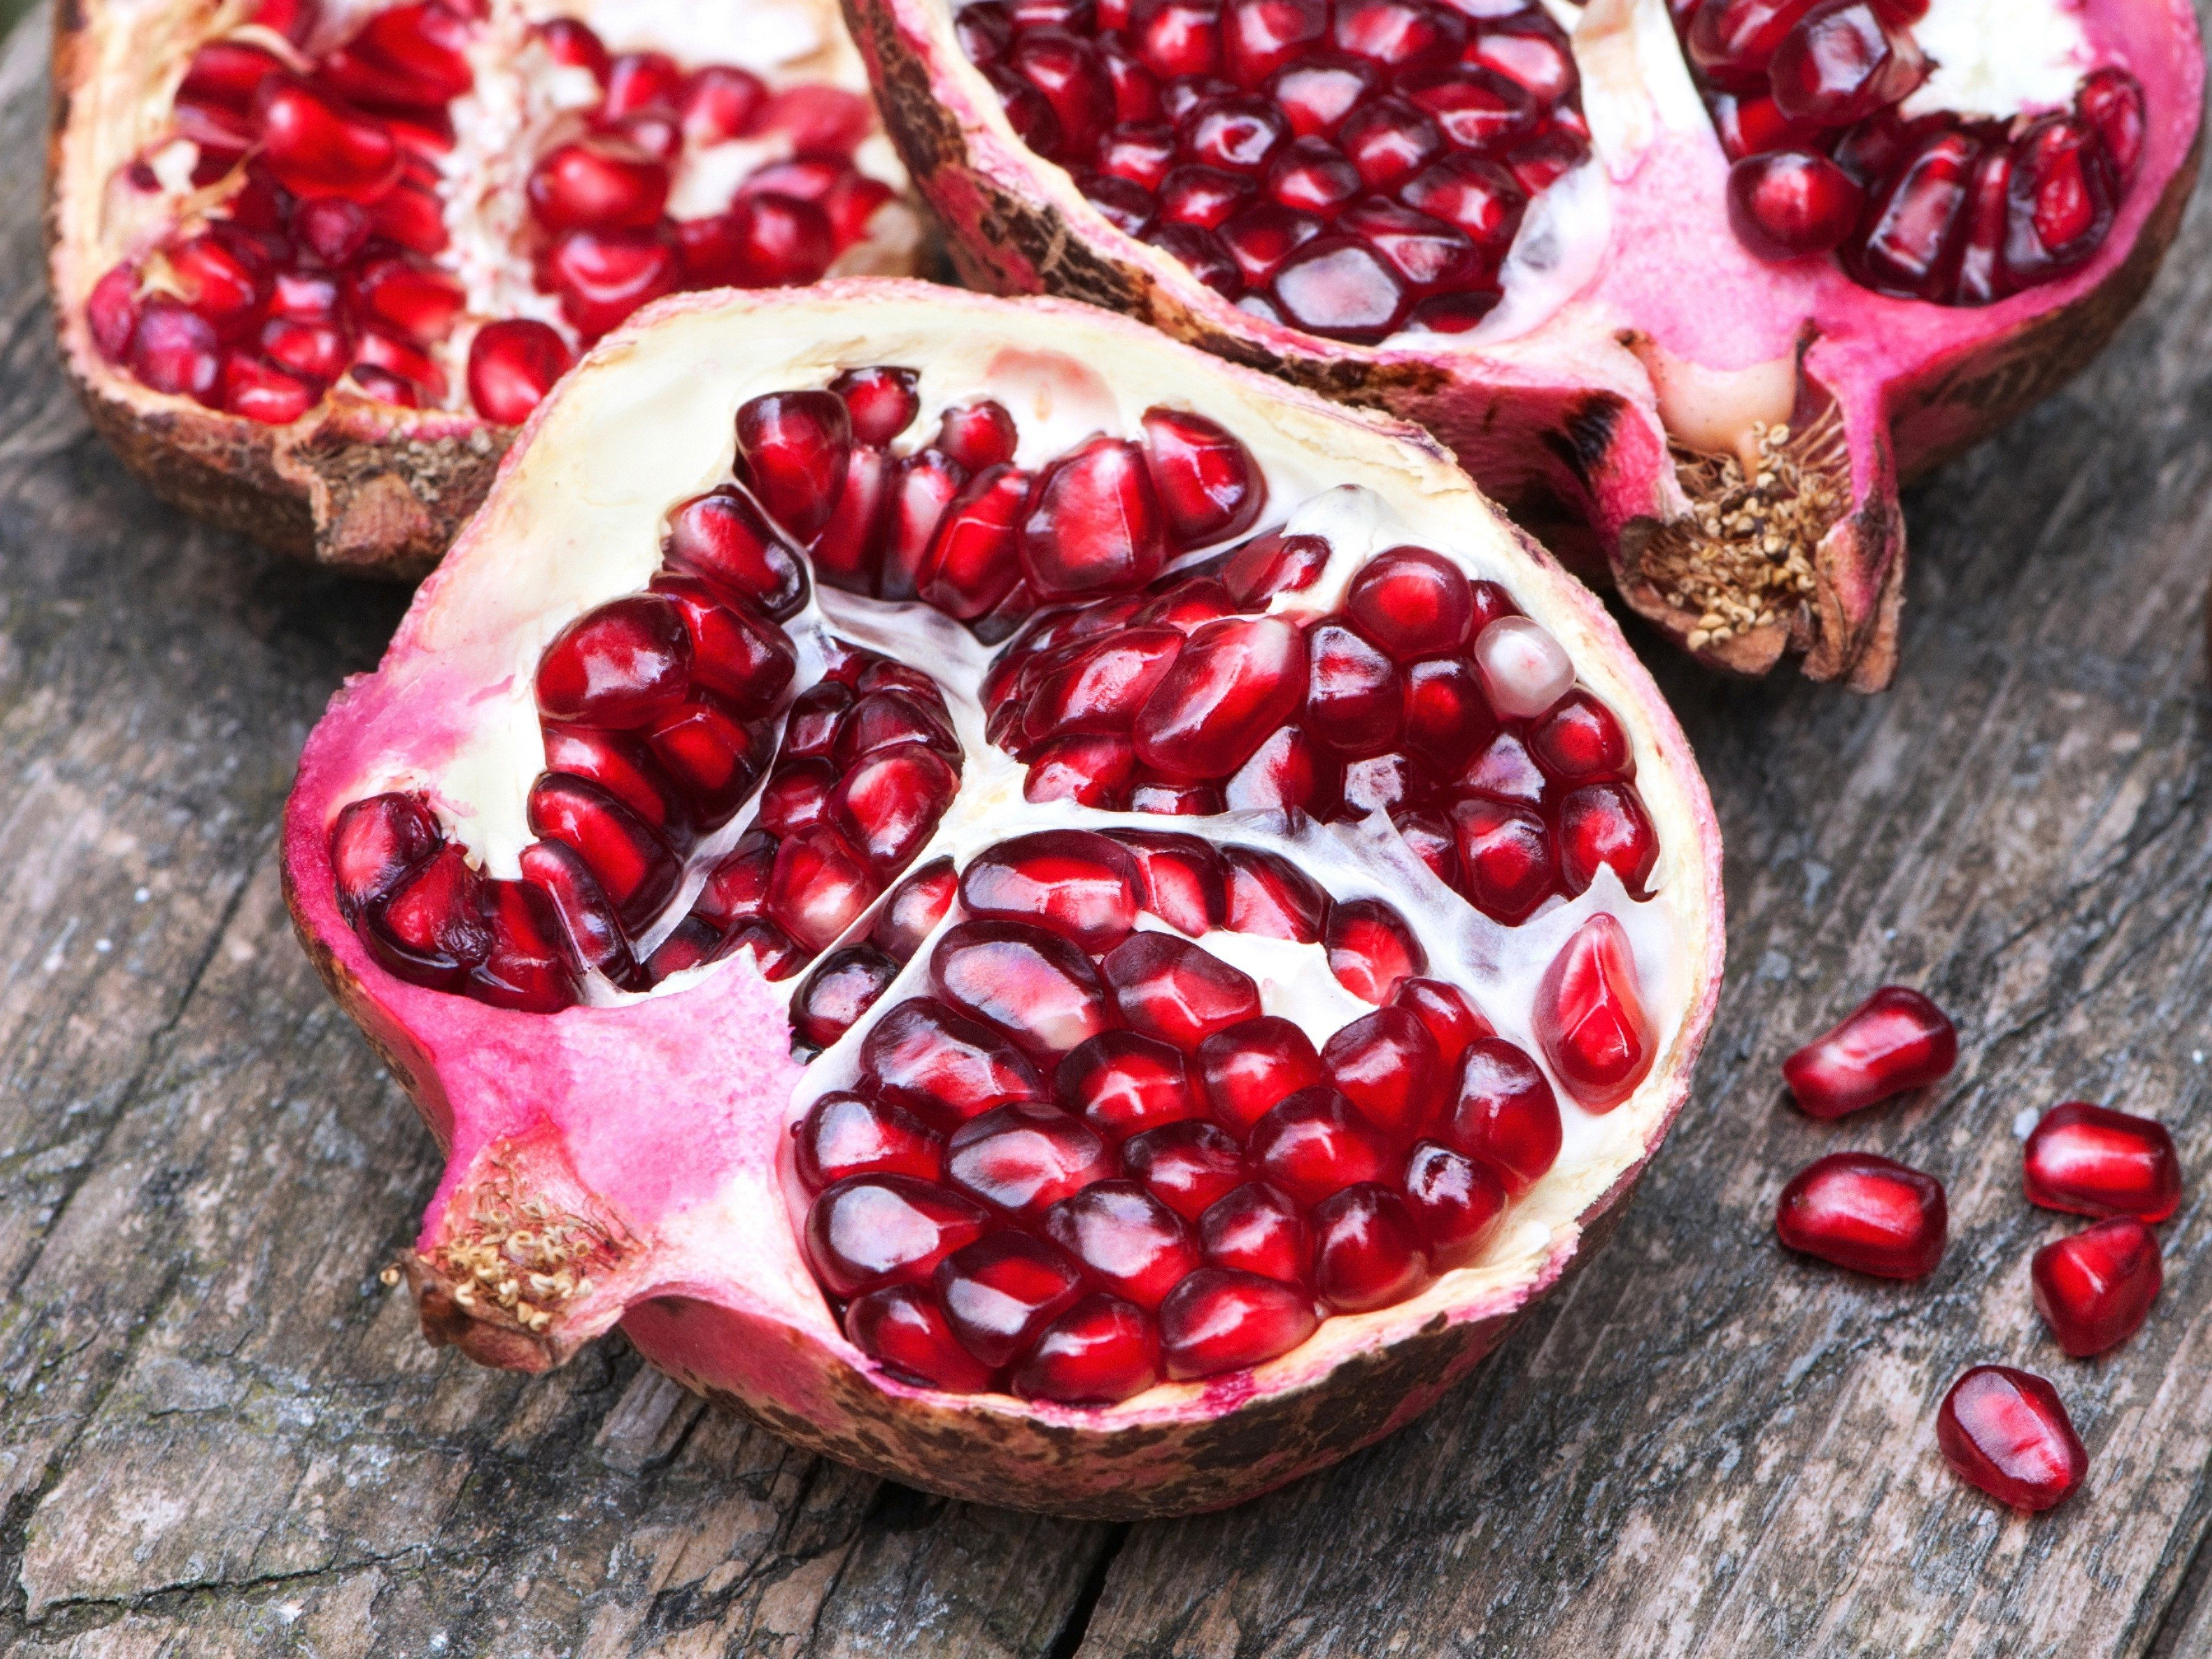 5. Drink a pomegranate blend.